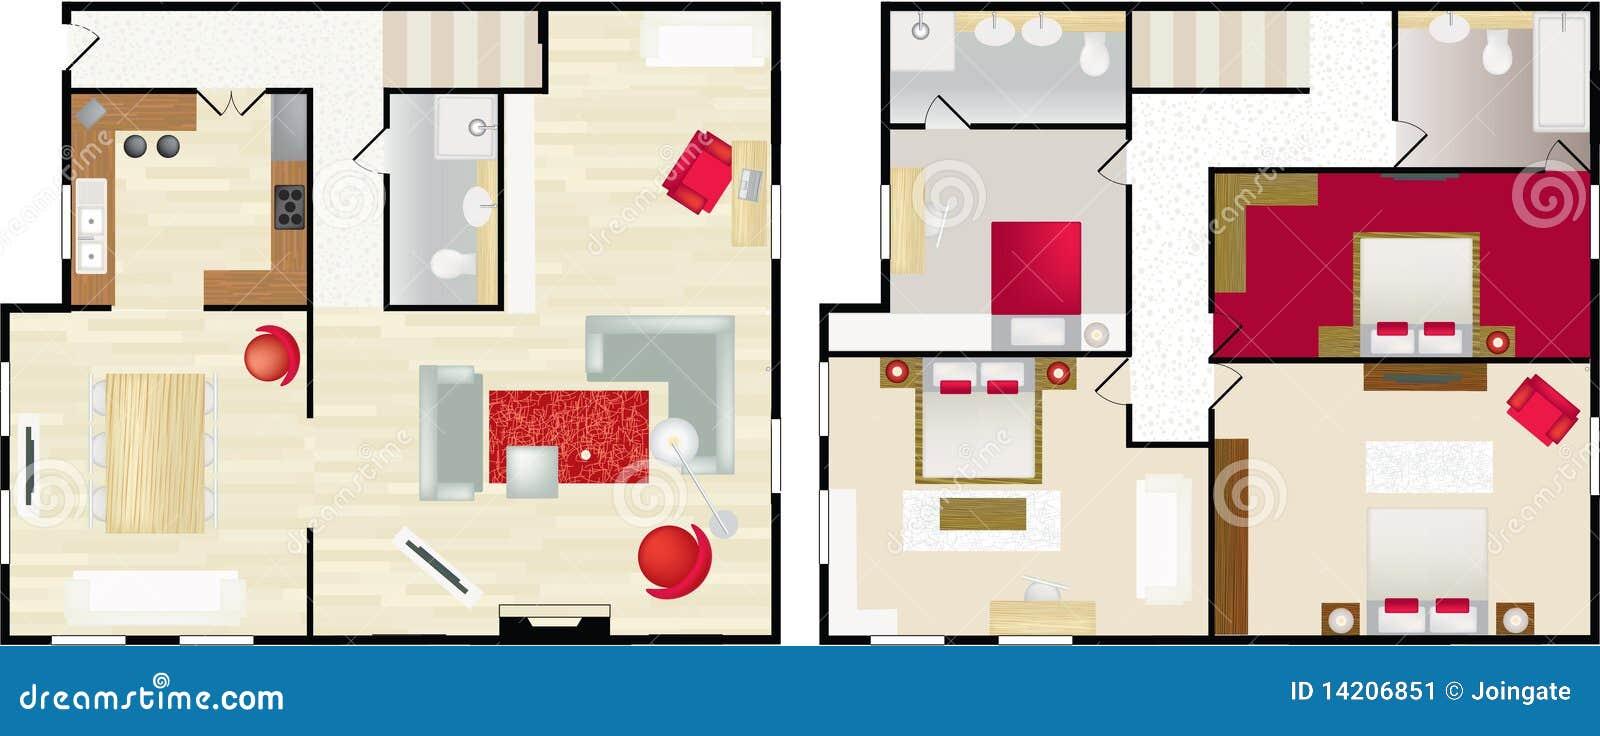 Floorplan Type De La Maison De S Image stock - Image: 14206851